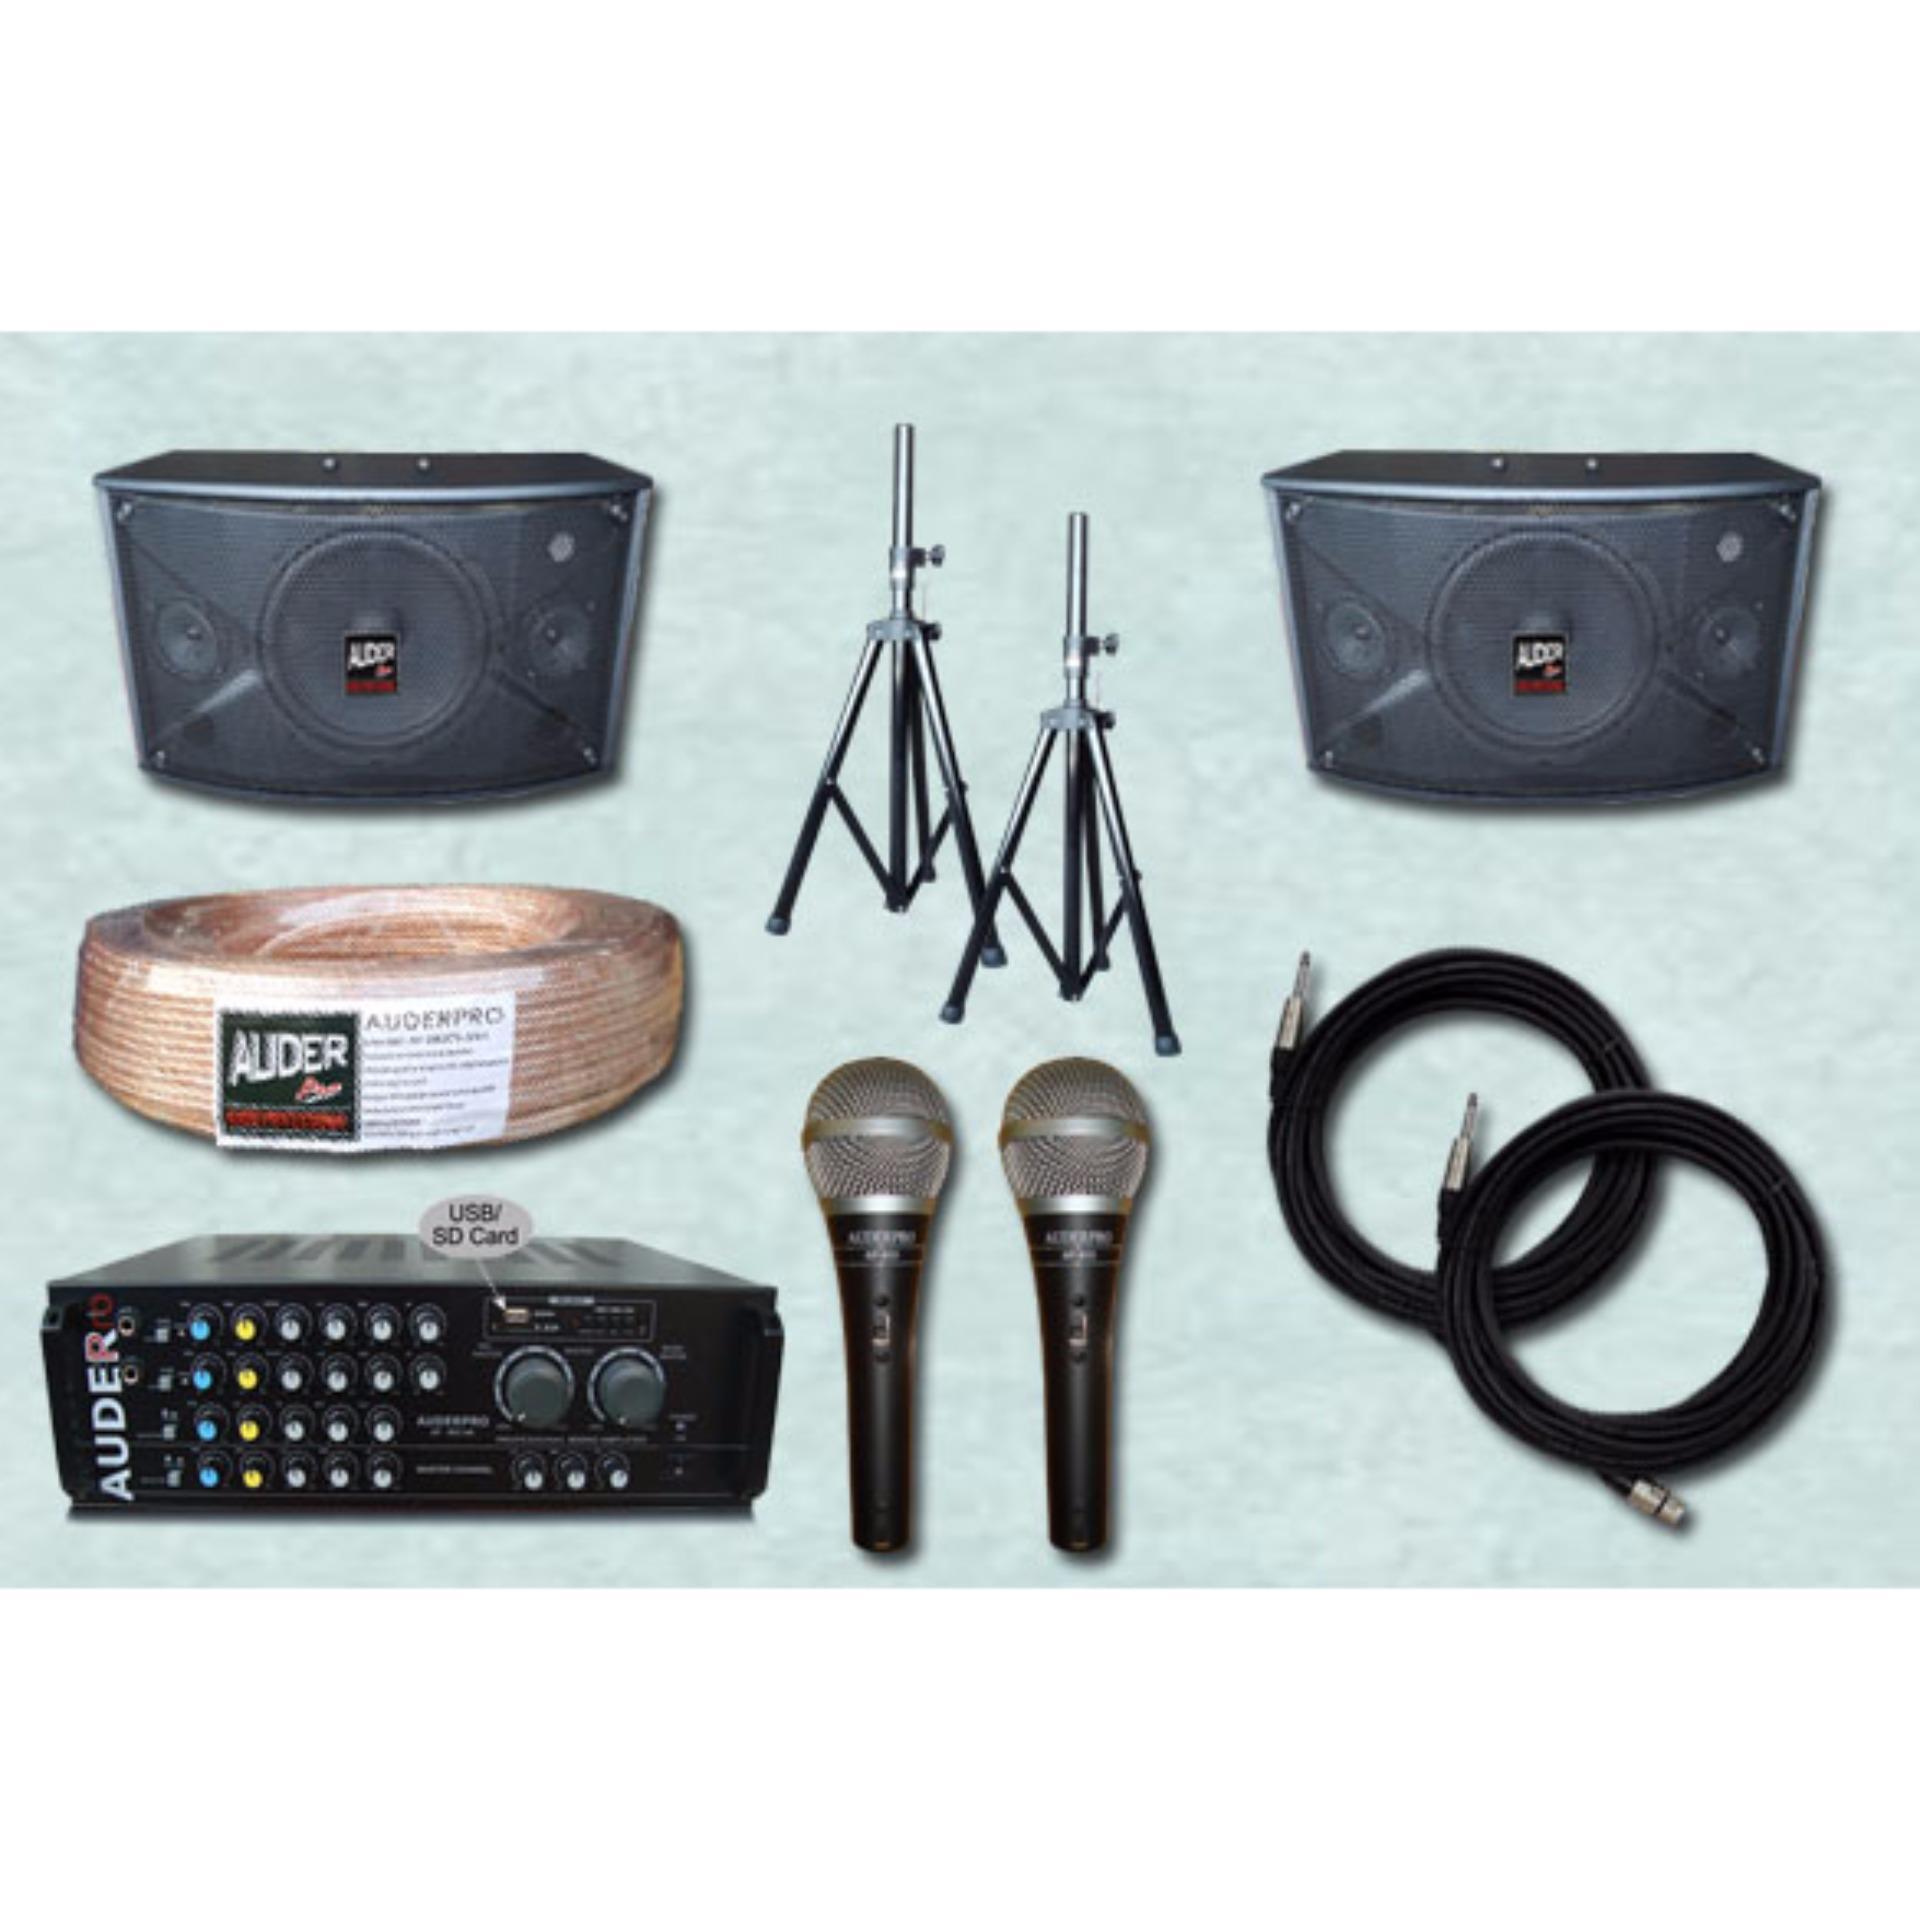 Spesifikasi Sound System Paket Rapat Kecil 10 Usb Auderpro Hitam Yang Bagus